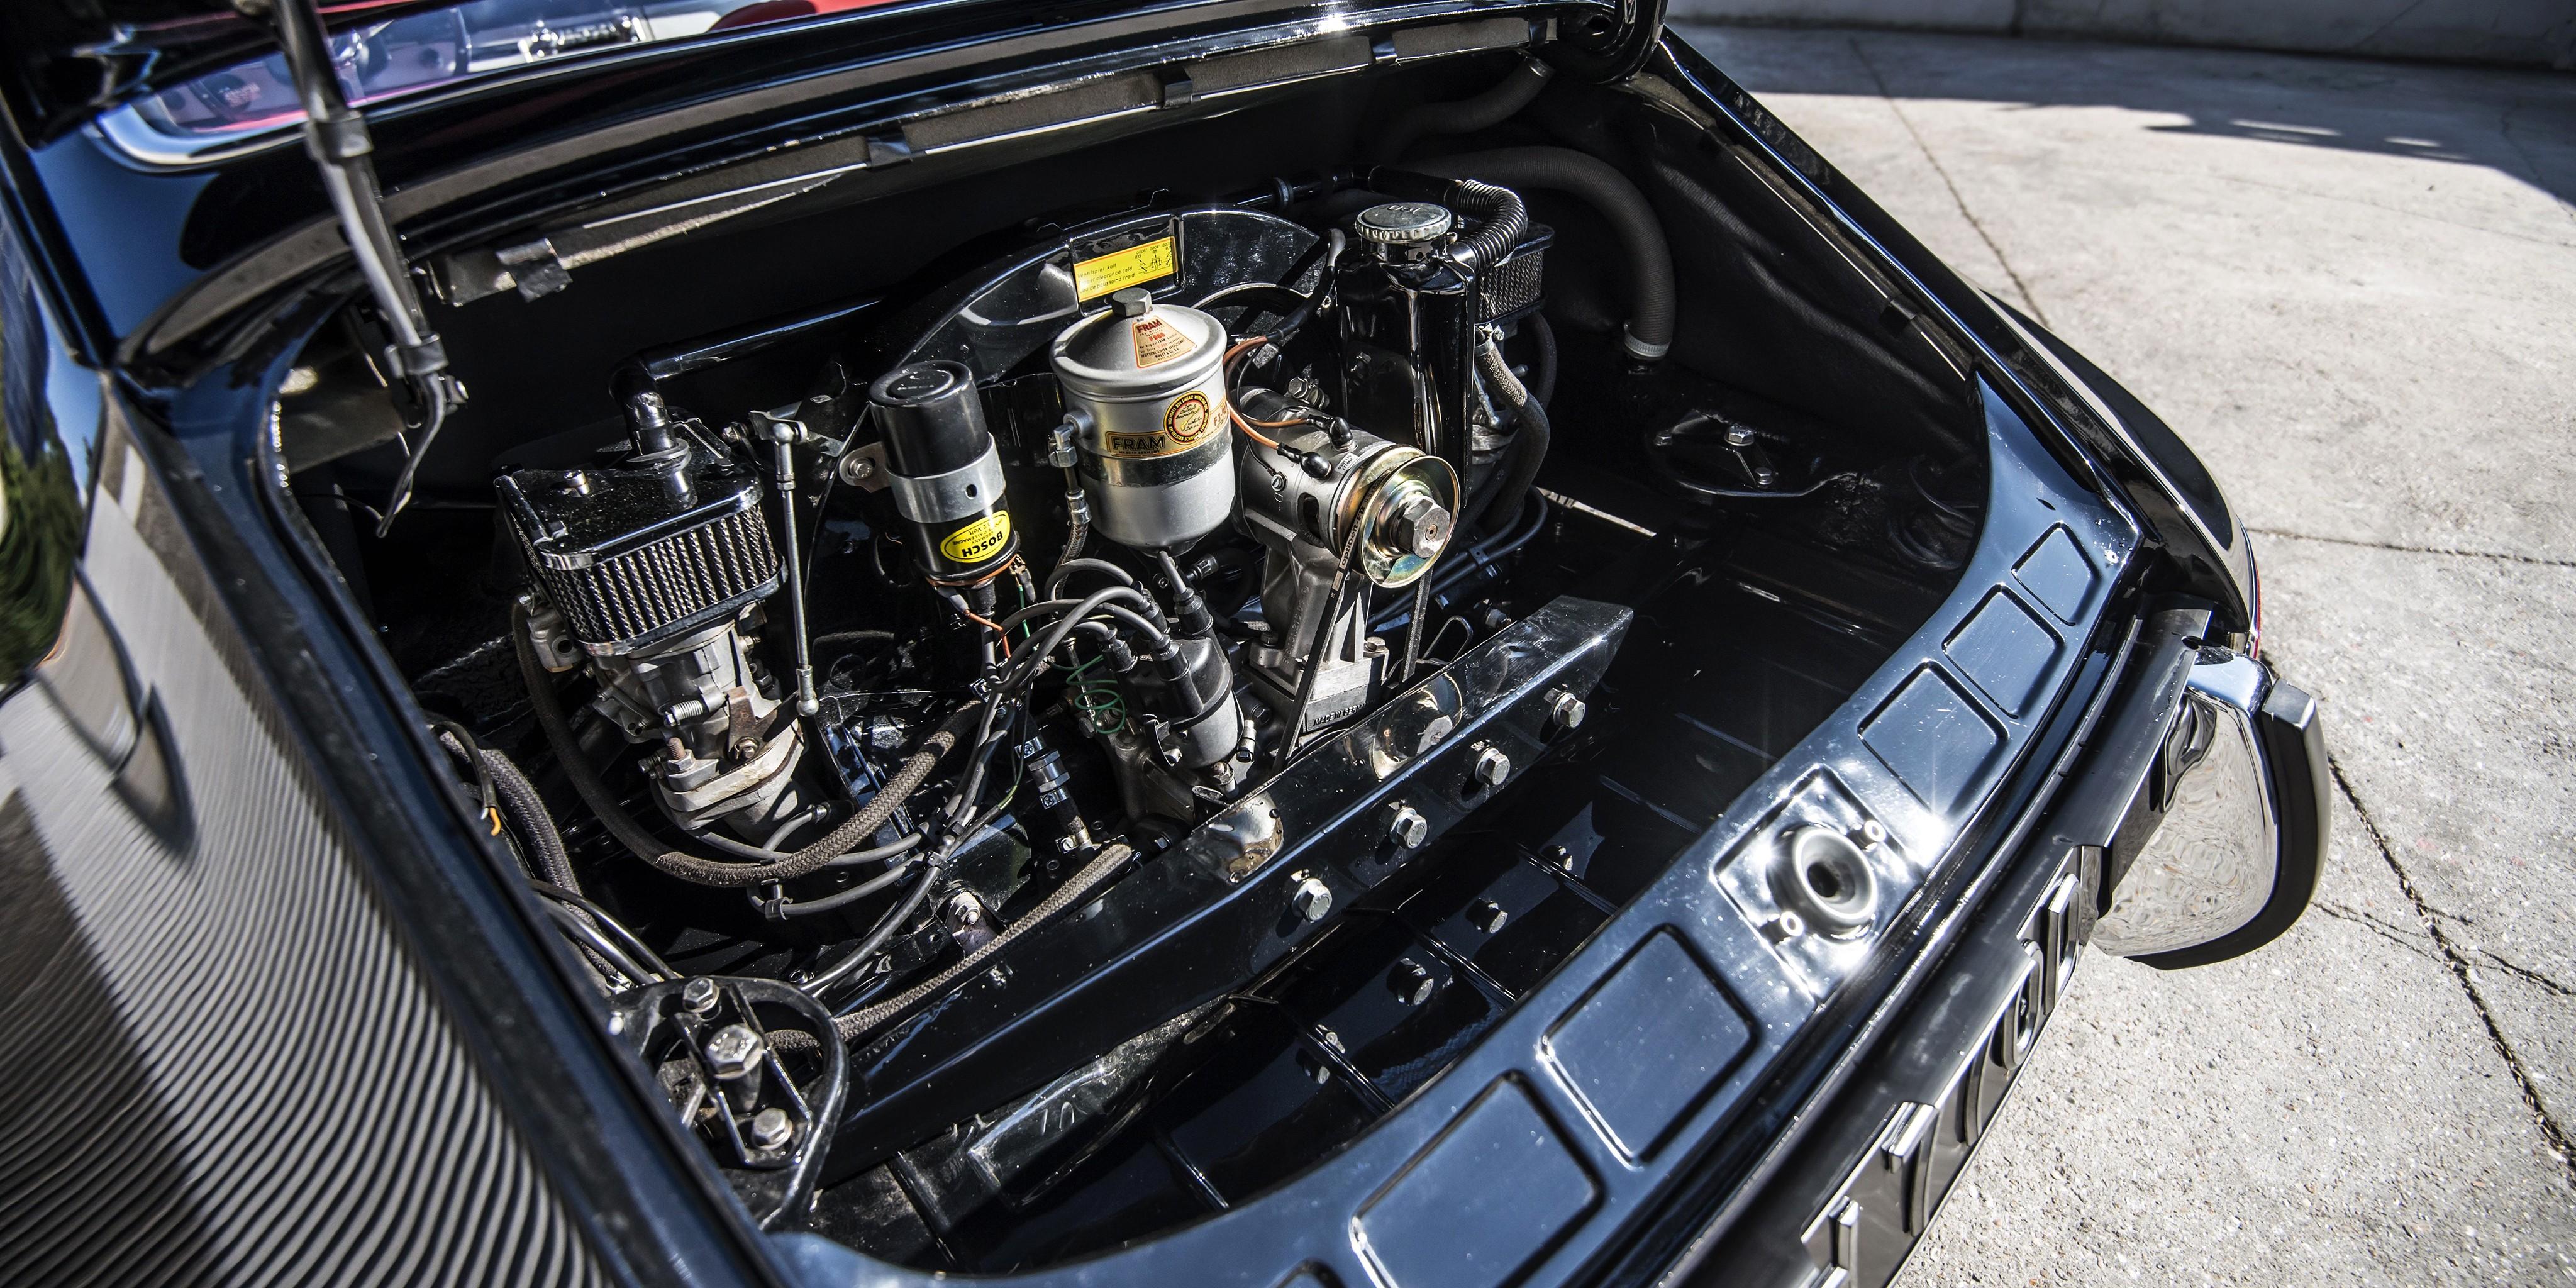 1968 porsche 912 engine diagram diy wiring diagrams u2022 rh newsmoke co Porsche 912 050 Distributors 1968 Porsche 912 Performance Engines